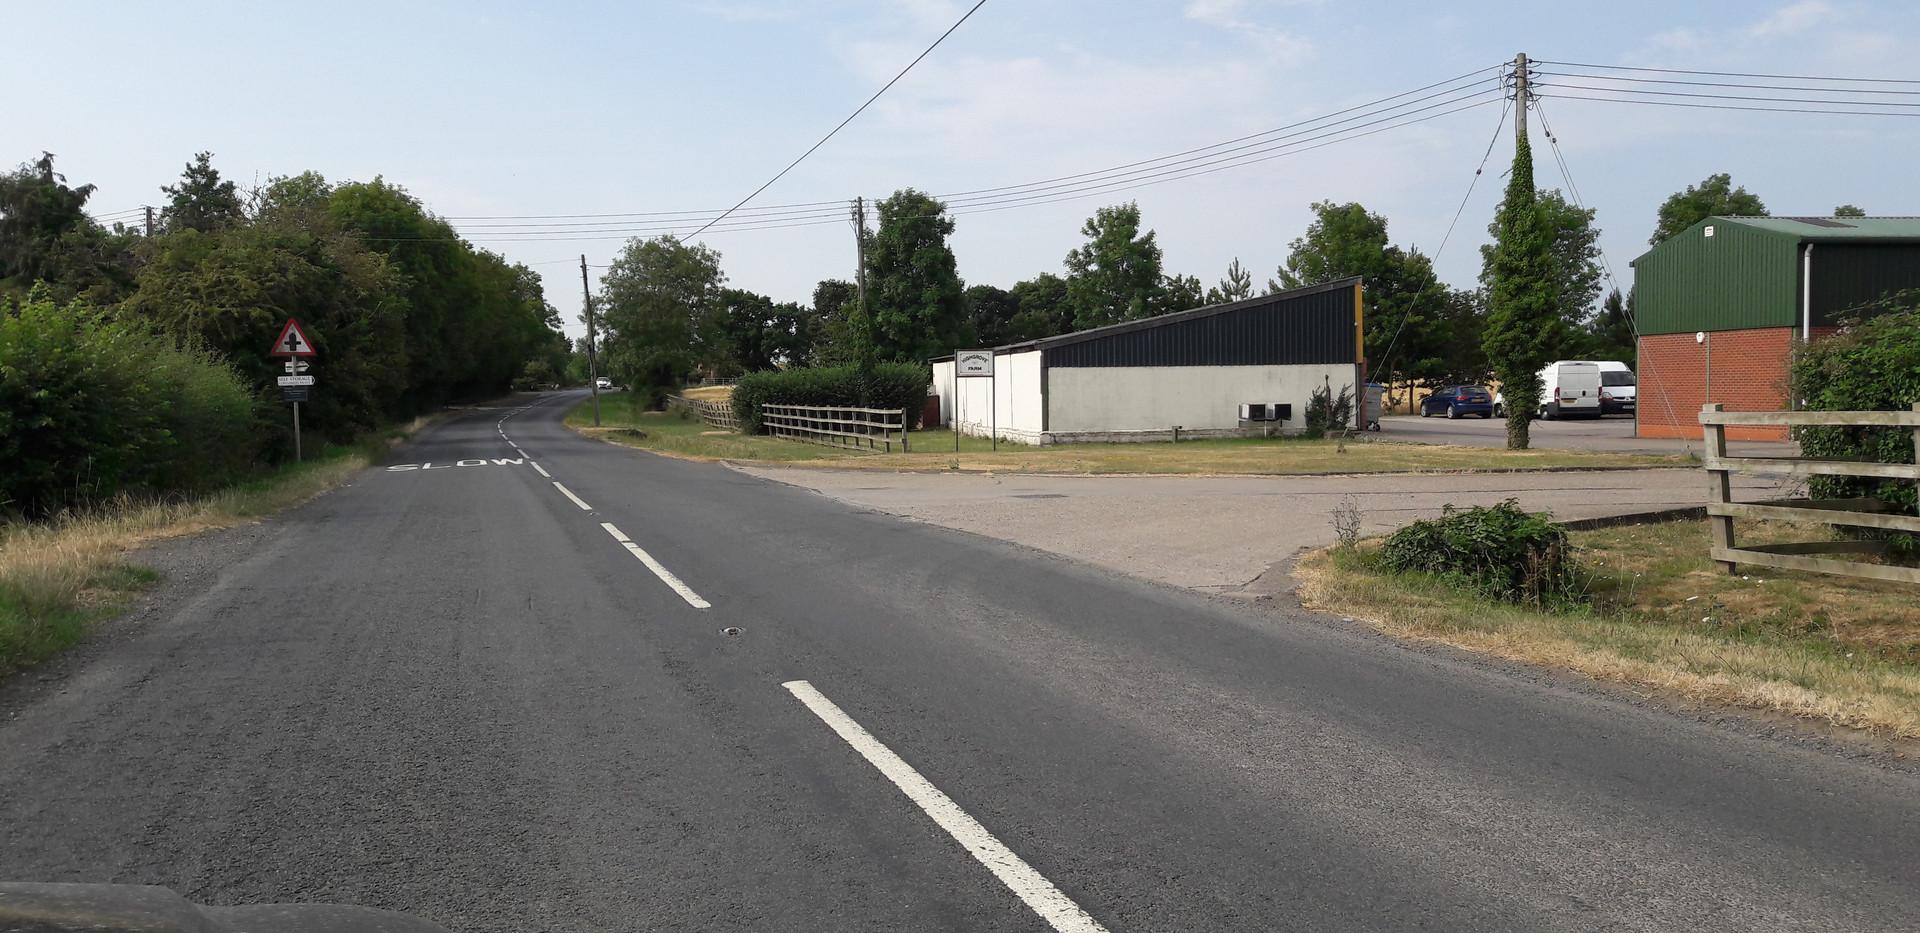 Road View Highgrove.jpg